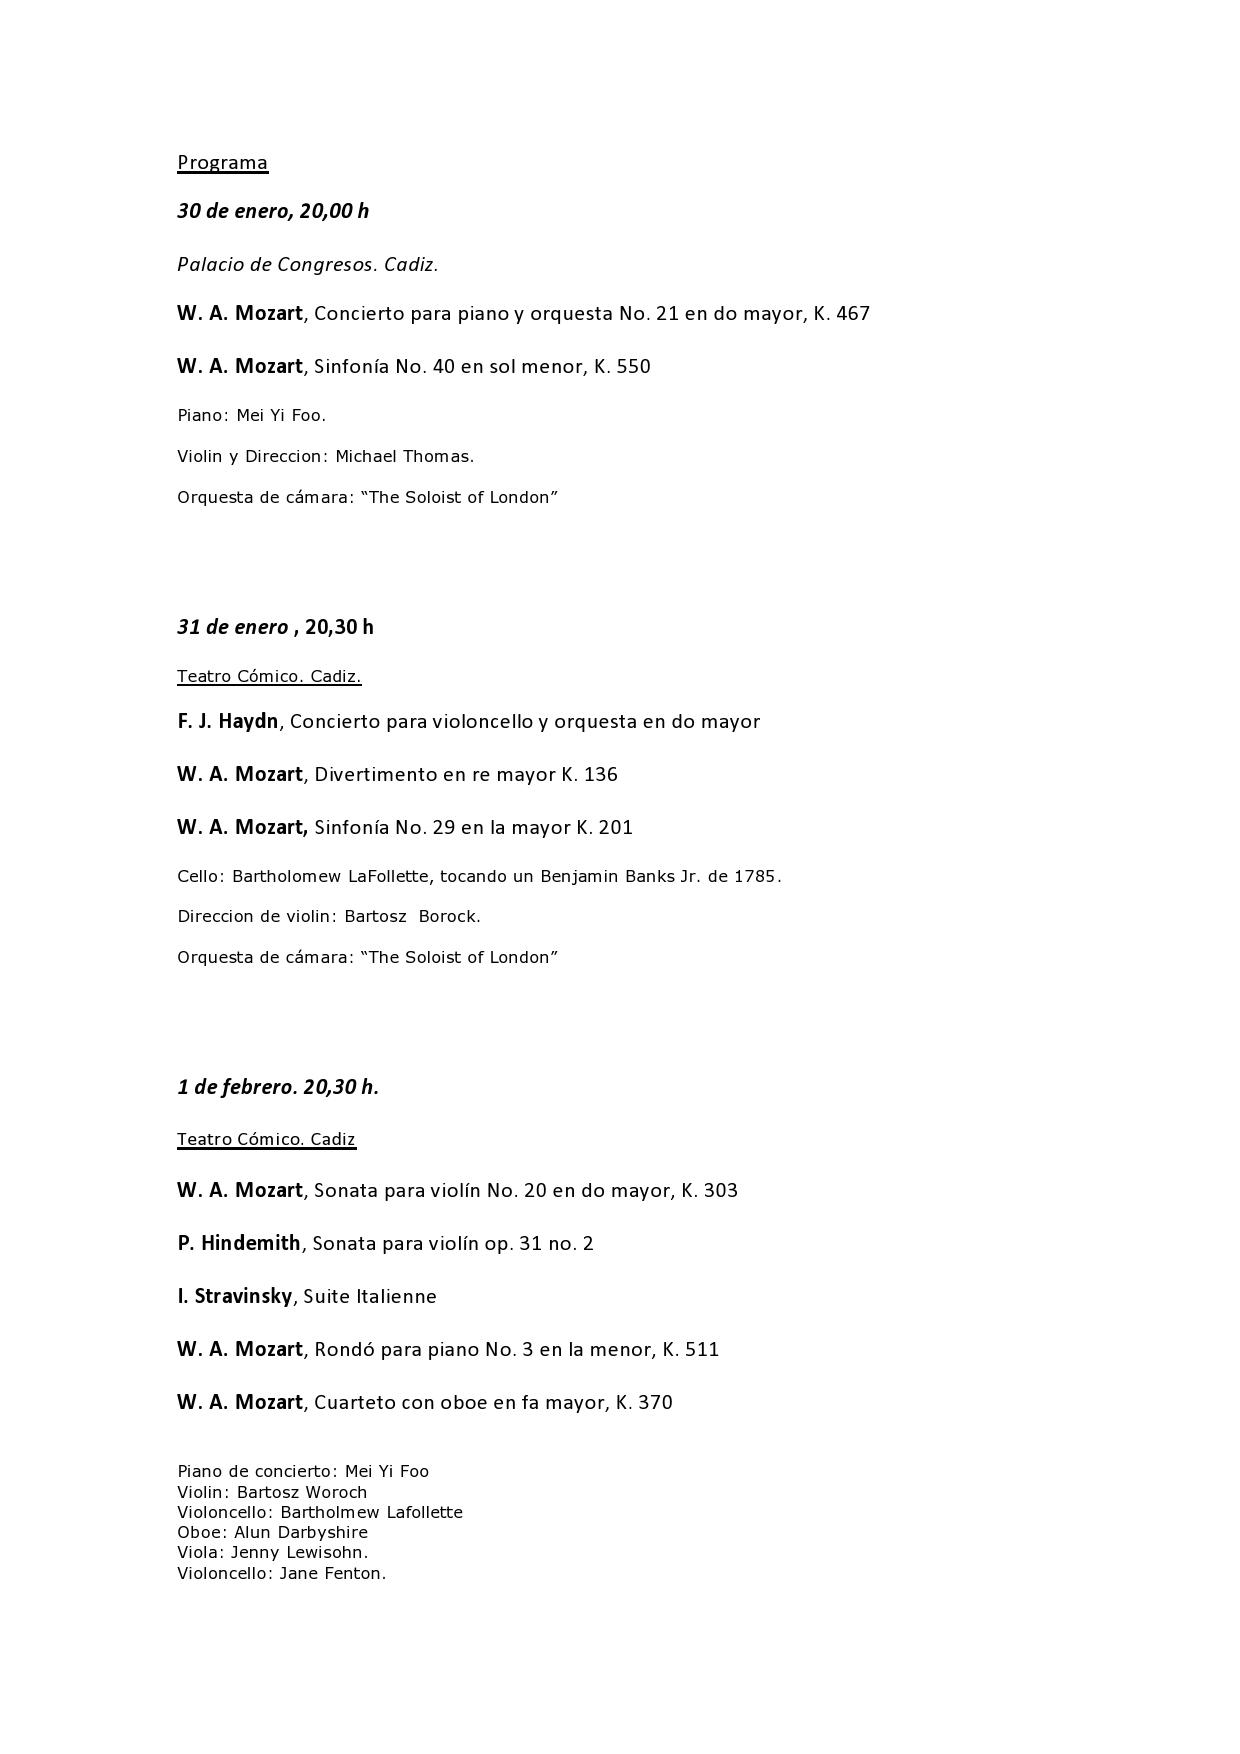 Programa Mozart 2.015-page0001